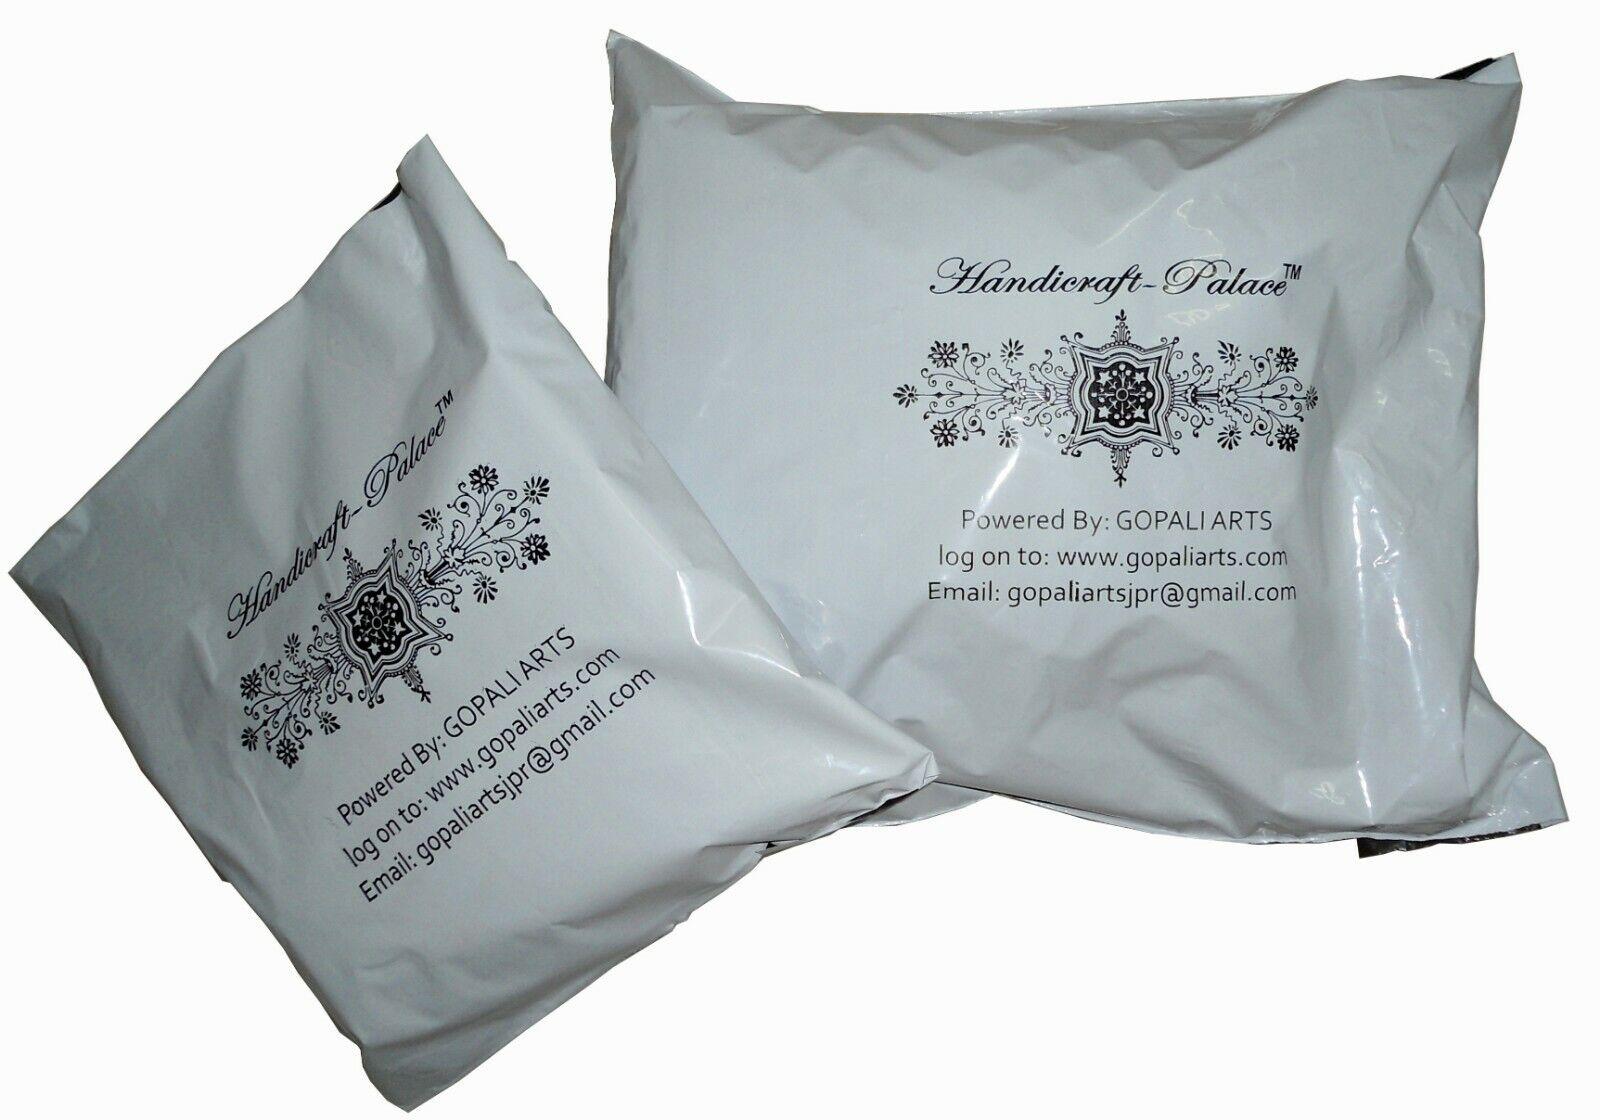 Kantha Quilt Patchwork Cotton Indian Bedspread Handmade Blanket King Größe Größe Größe Crazy 66dff0